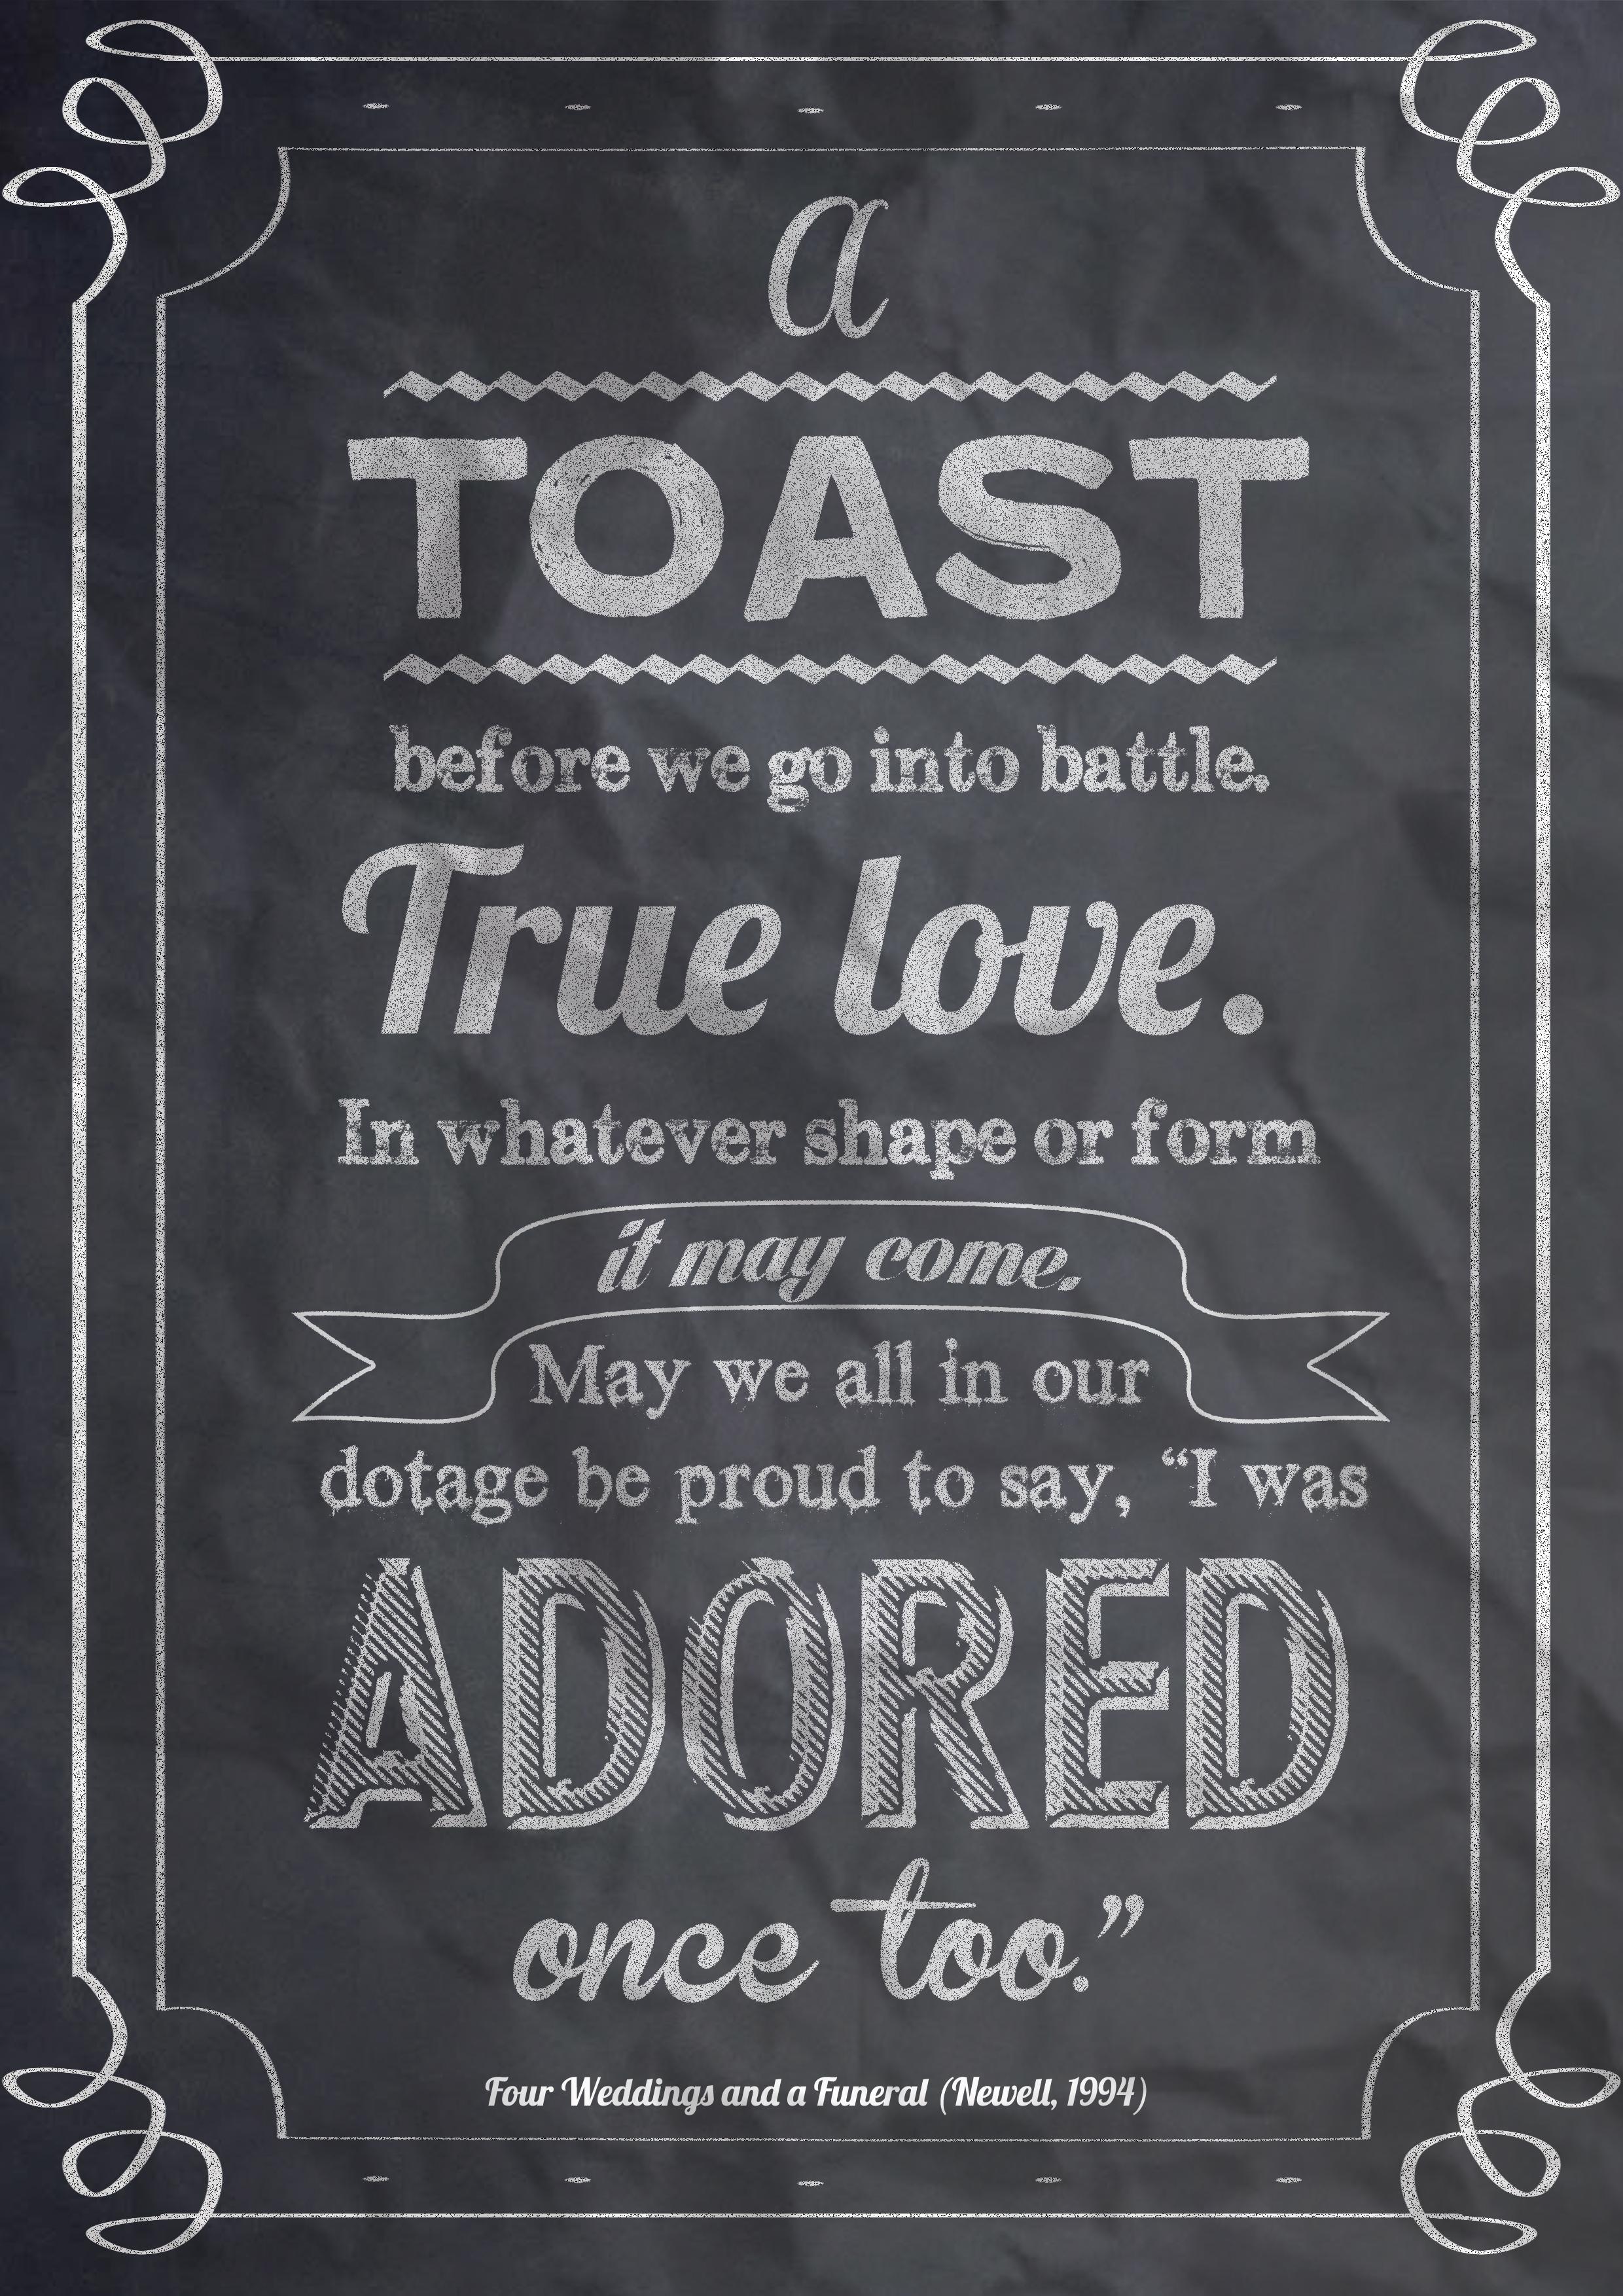 Film quote poster